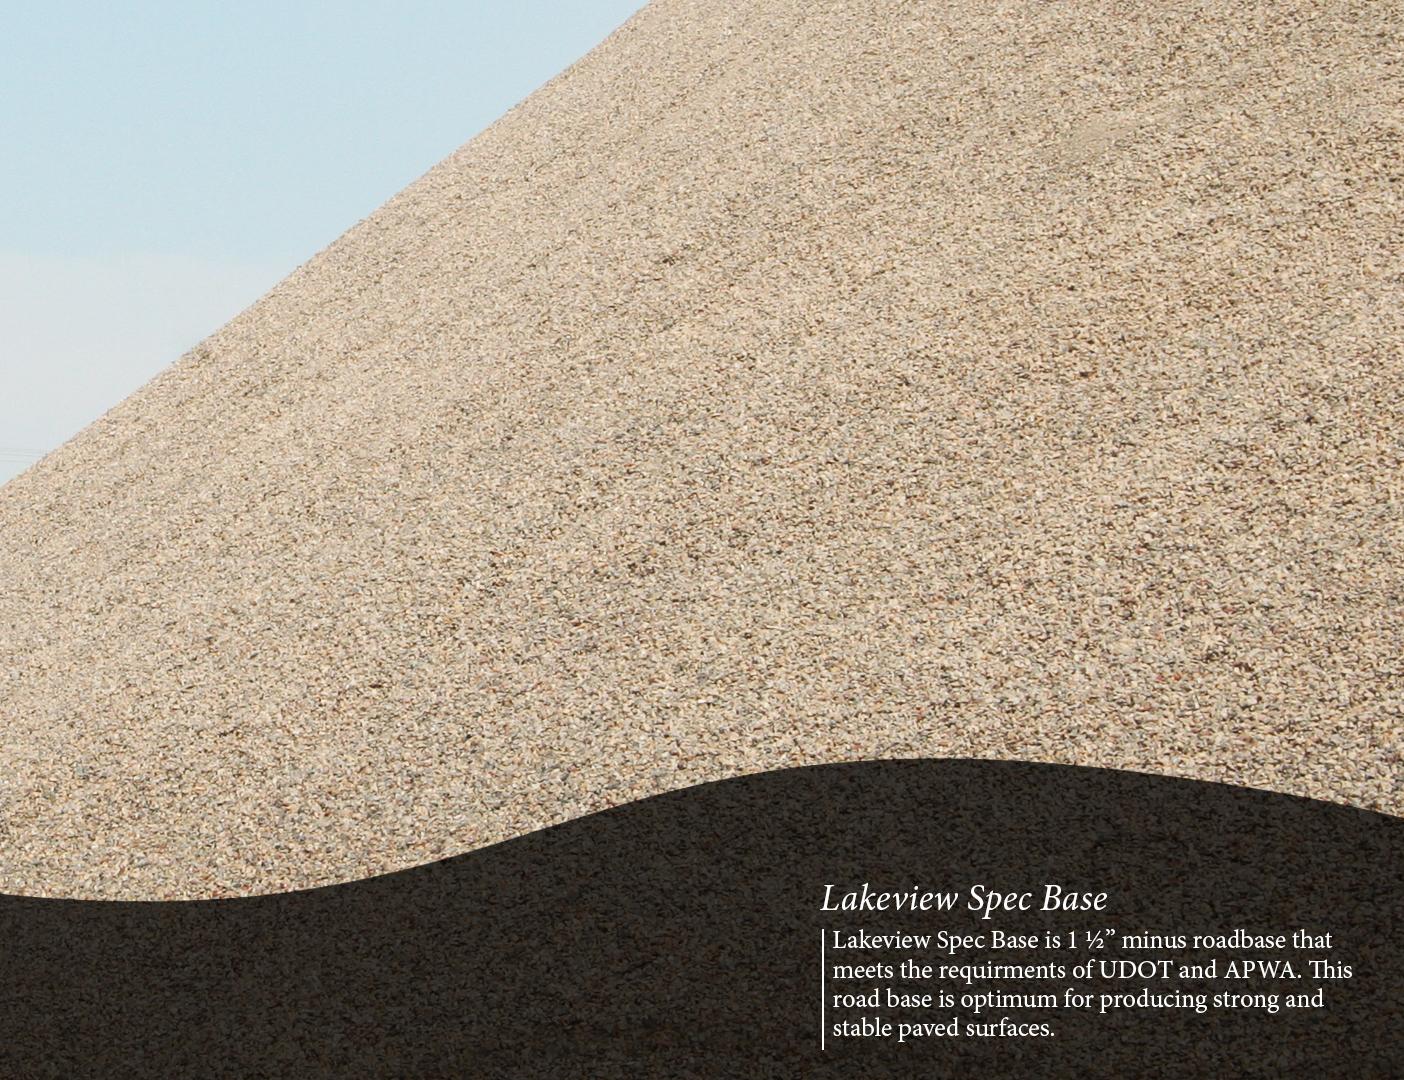 lakeviewspecbase.jpg